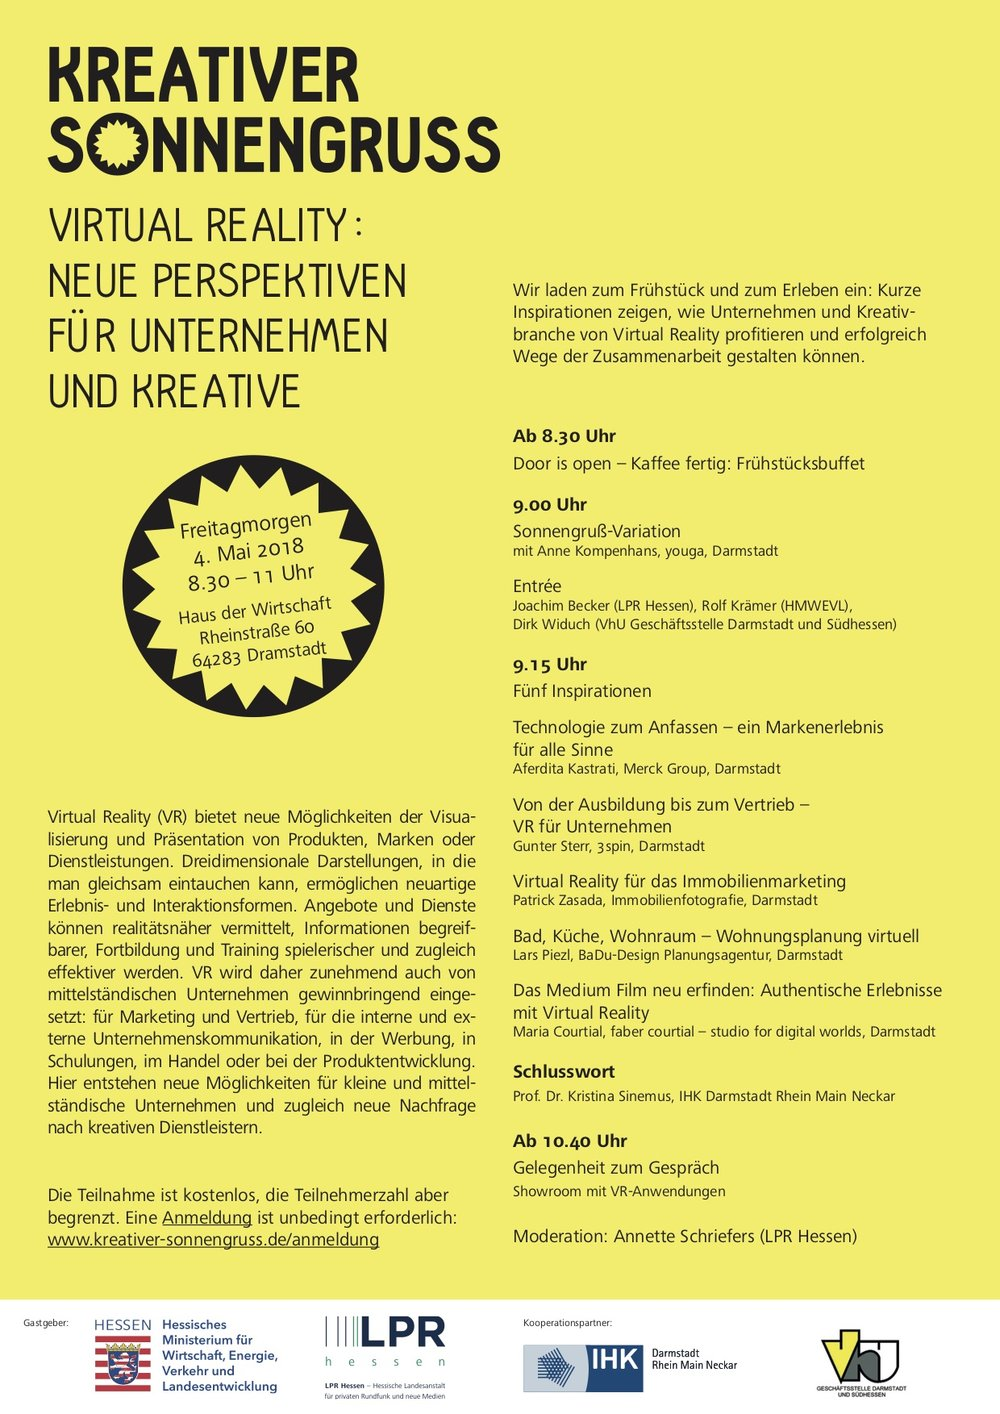 Darmstadt Veranstaltung vr marketing